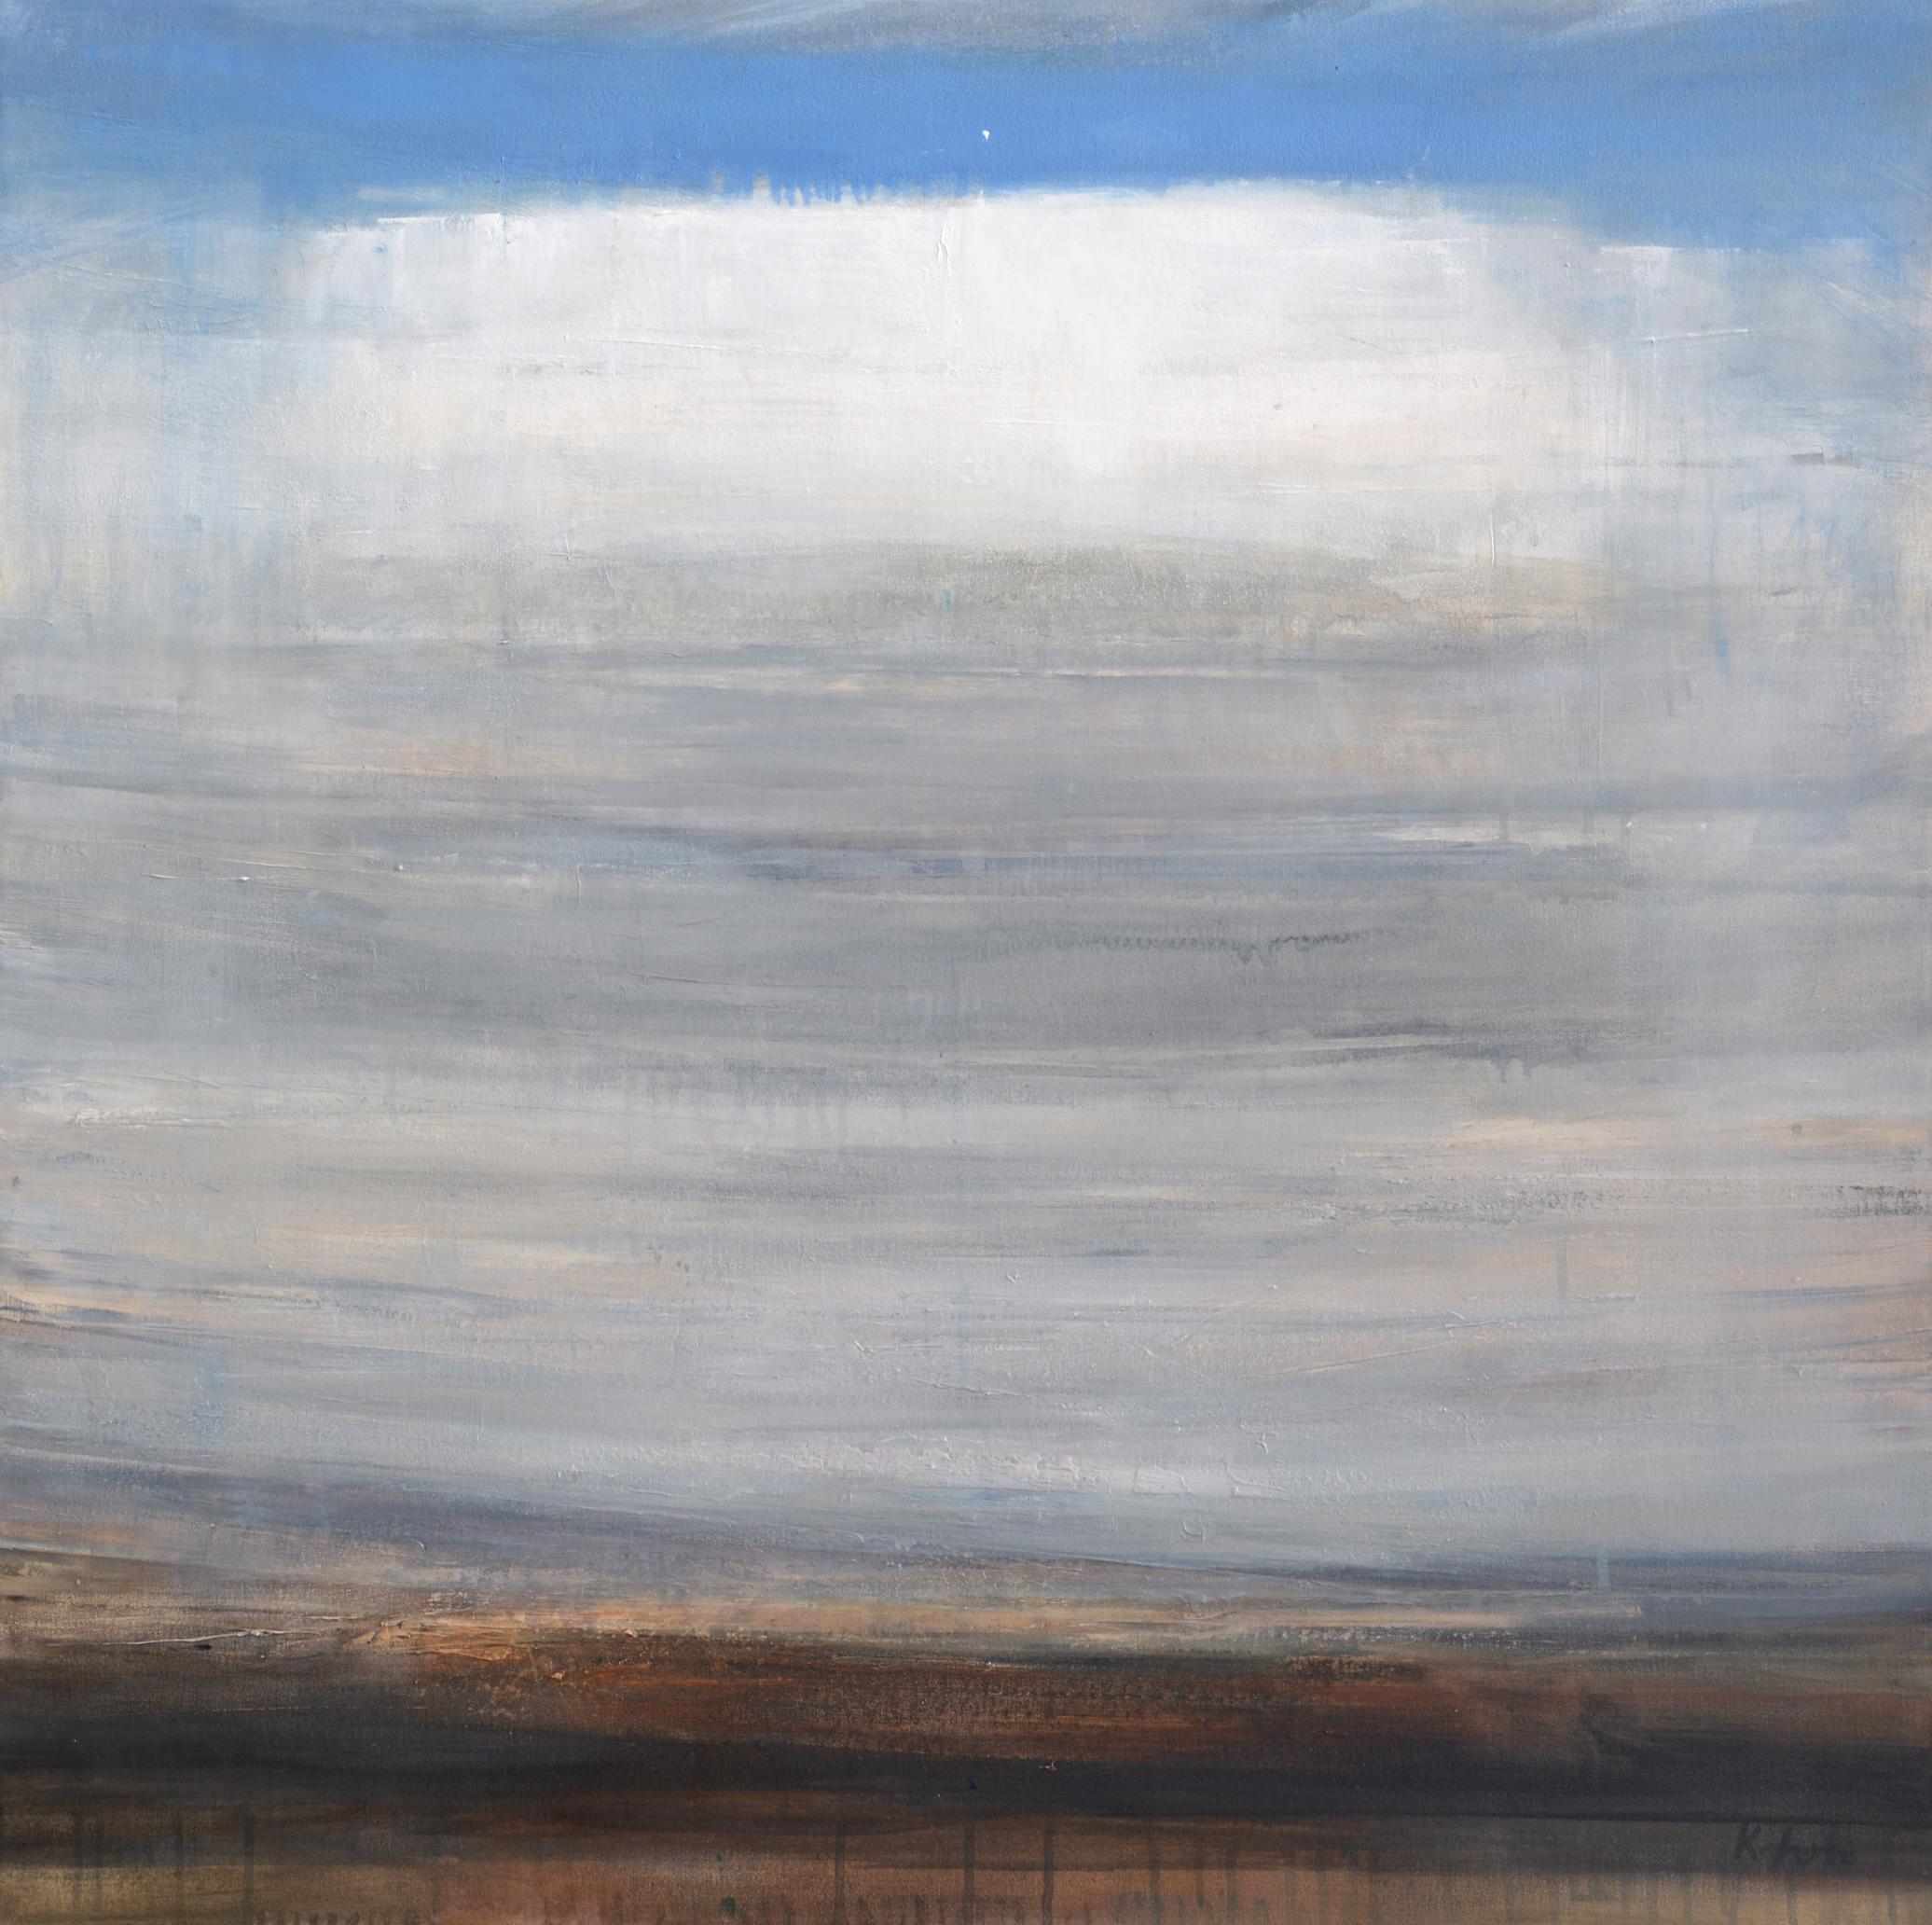 "Cumulo    oil on canvas  36 x 32""  2015"